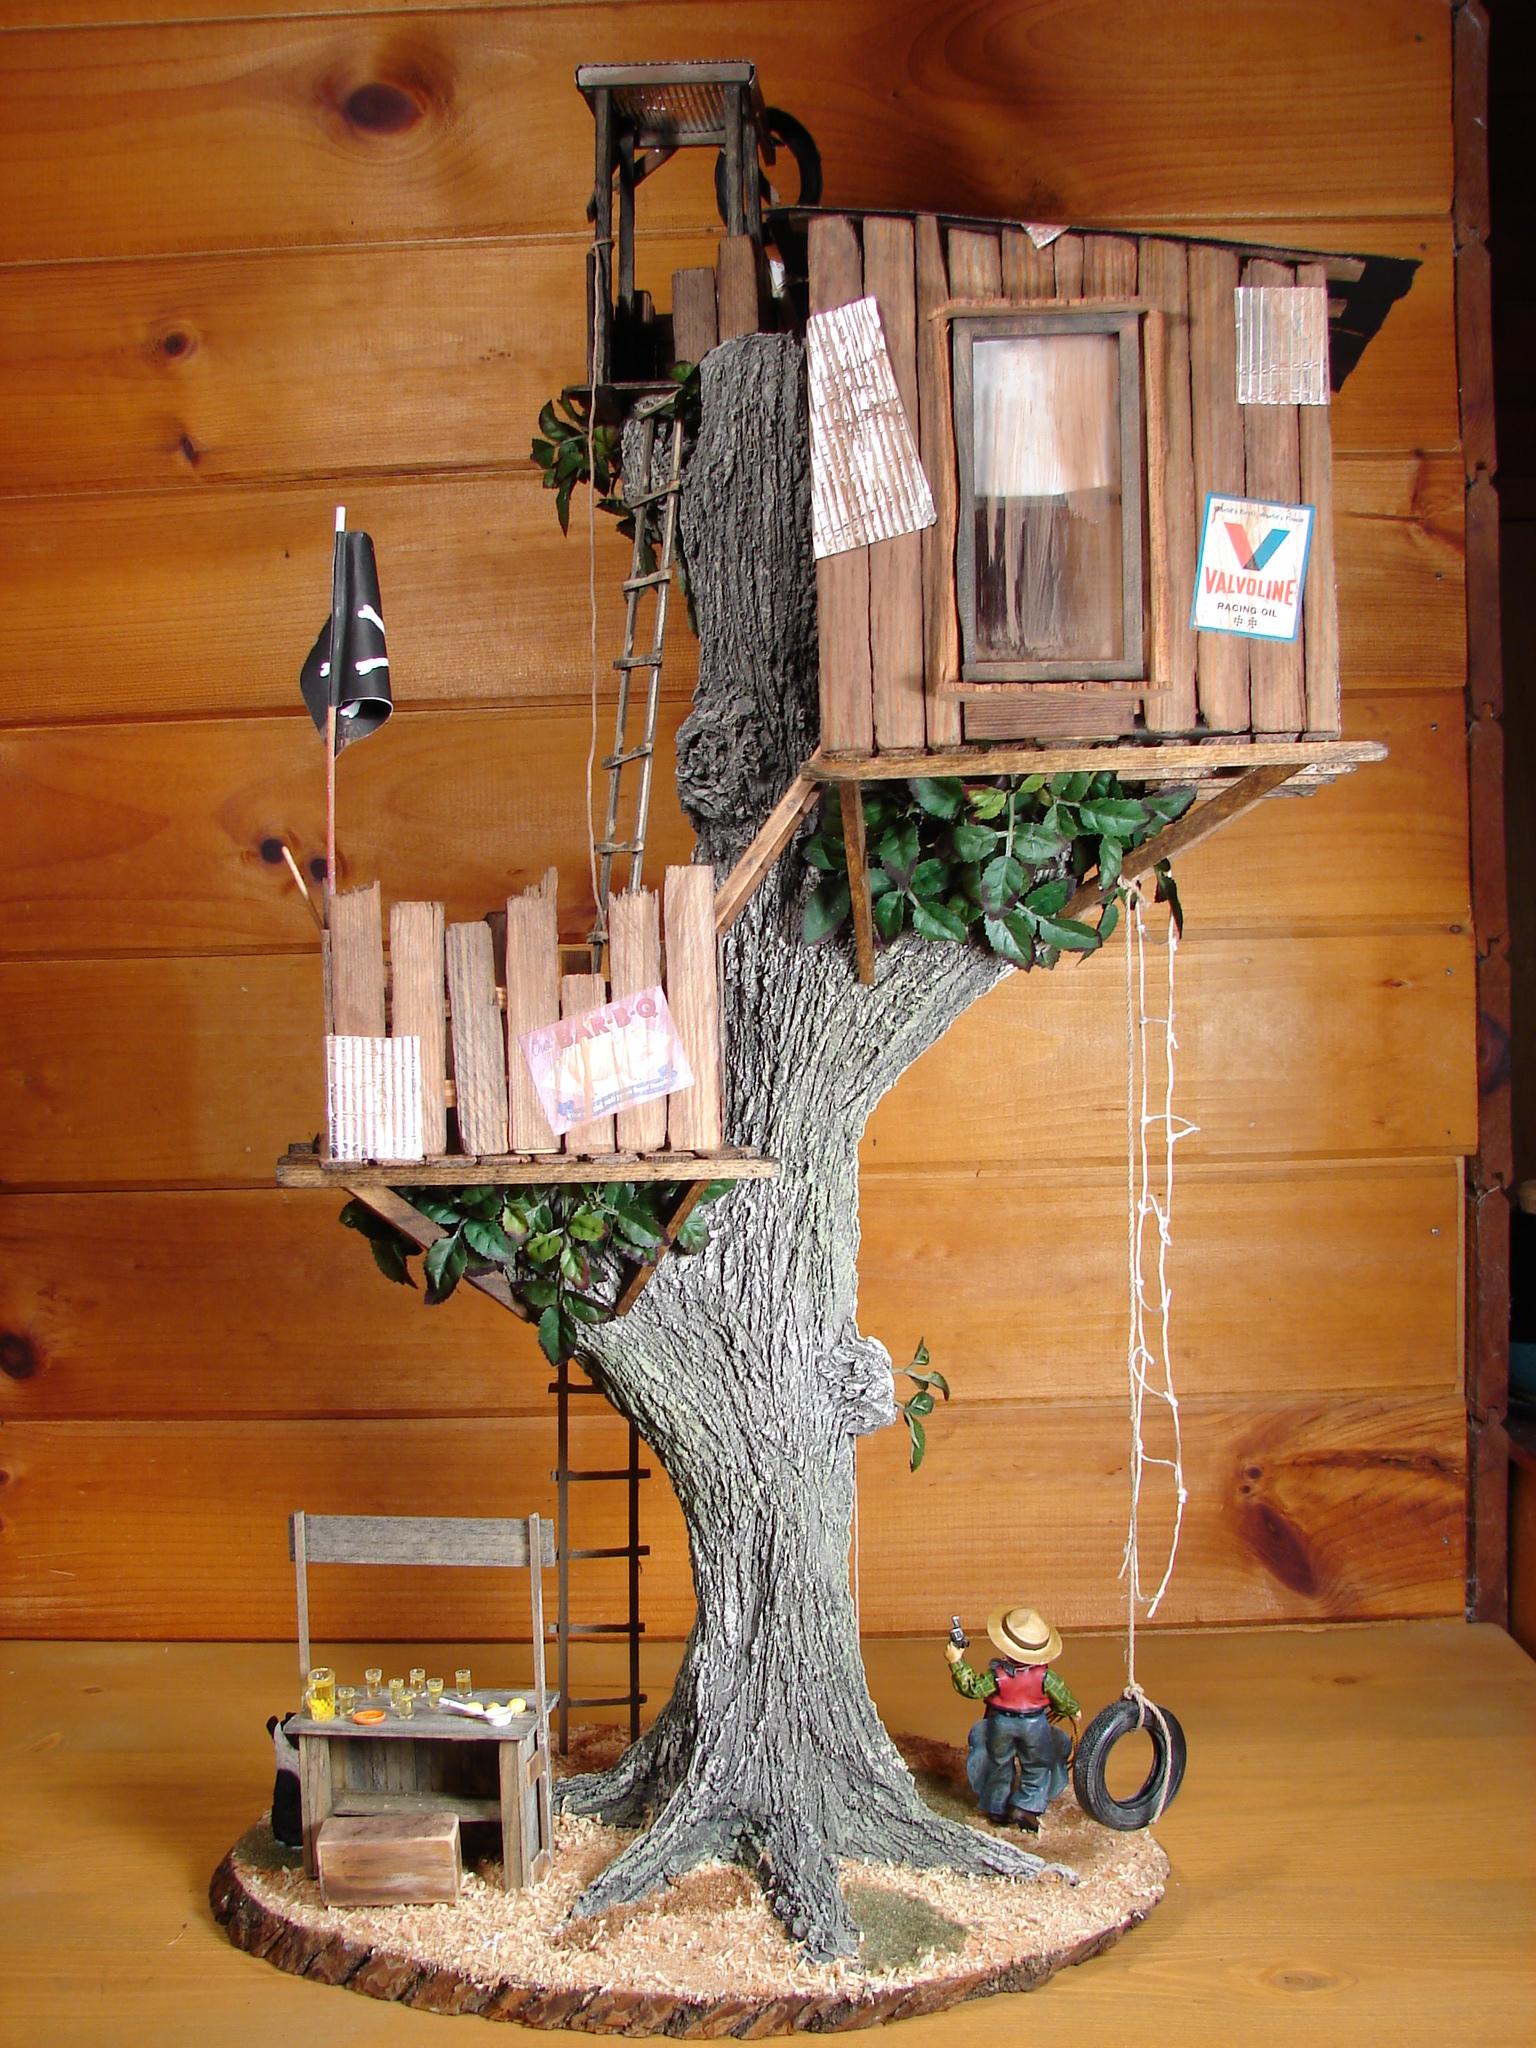 Miniature Tree House 1:12 scale handcrafted tree houseann maselli